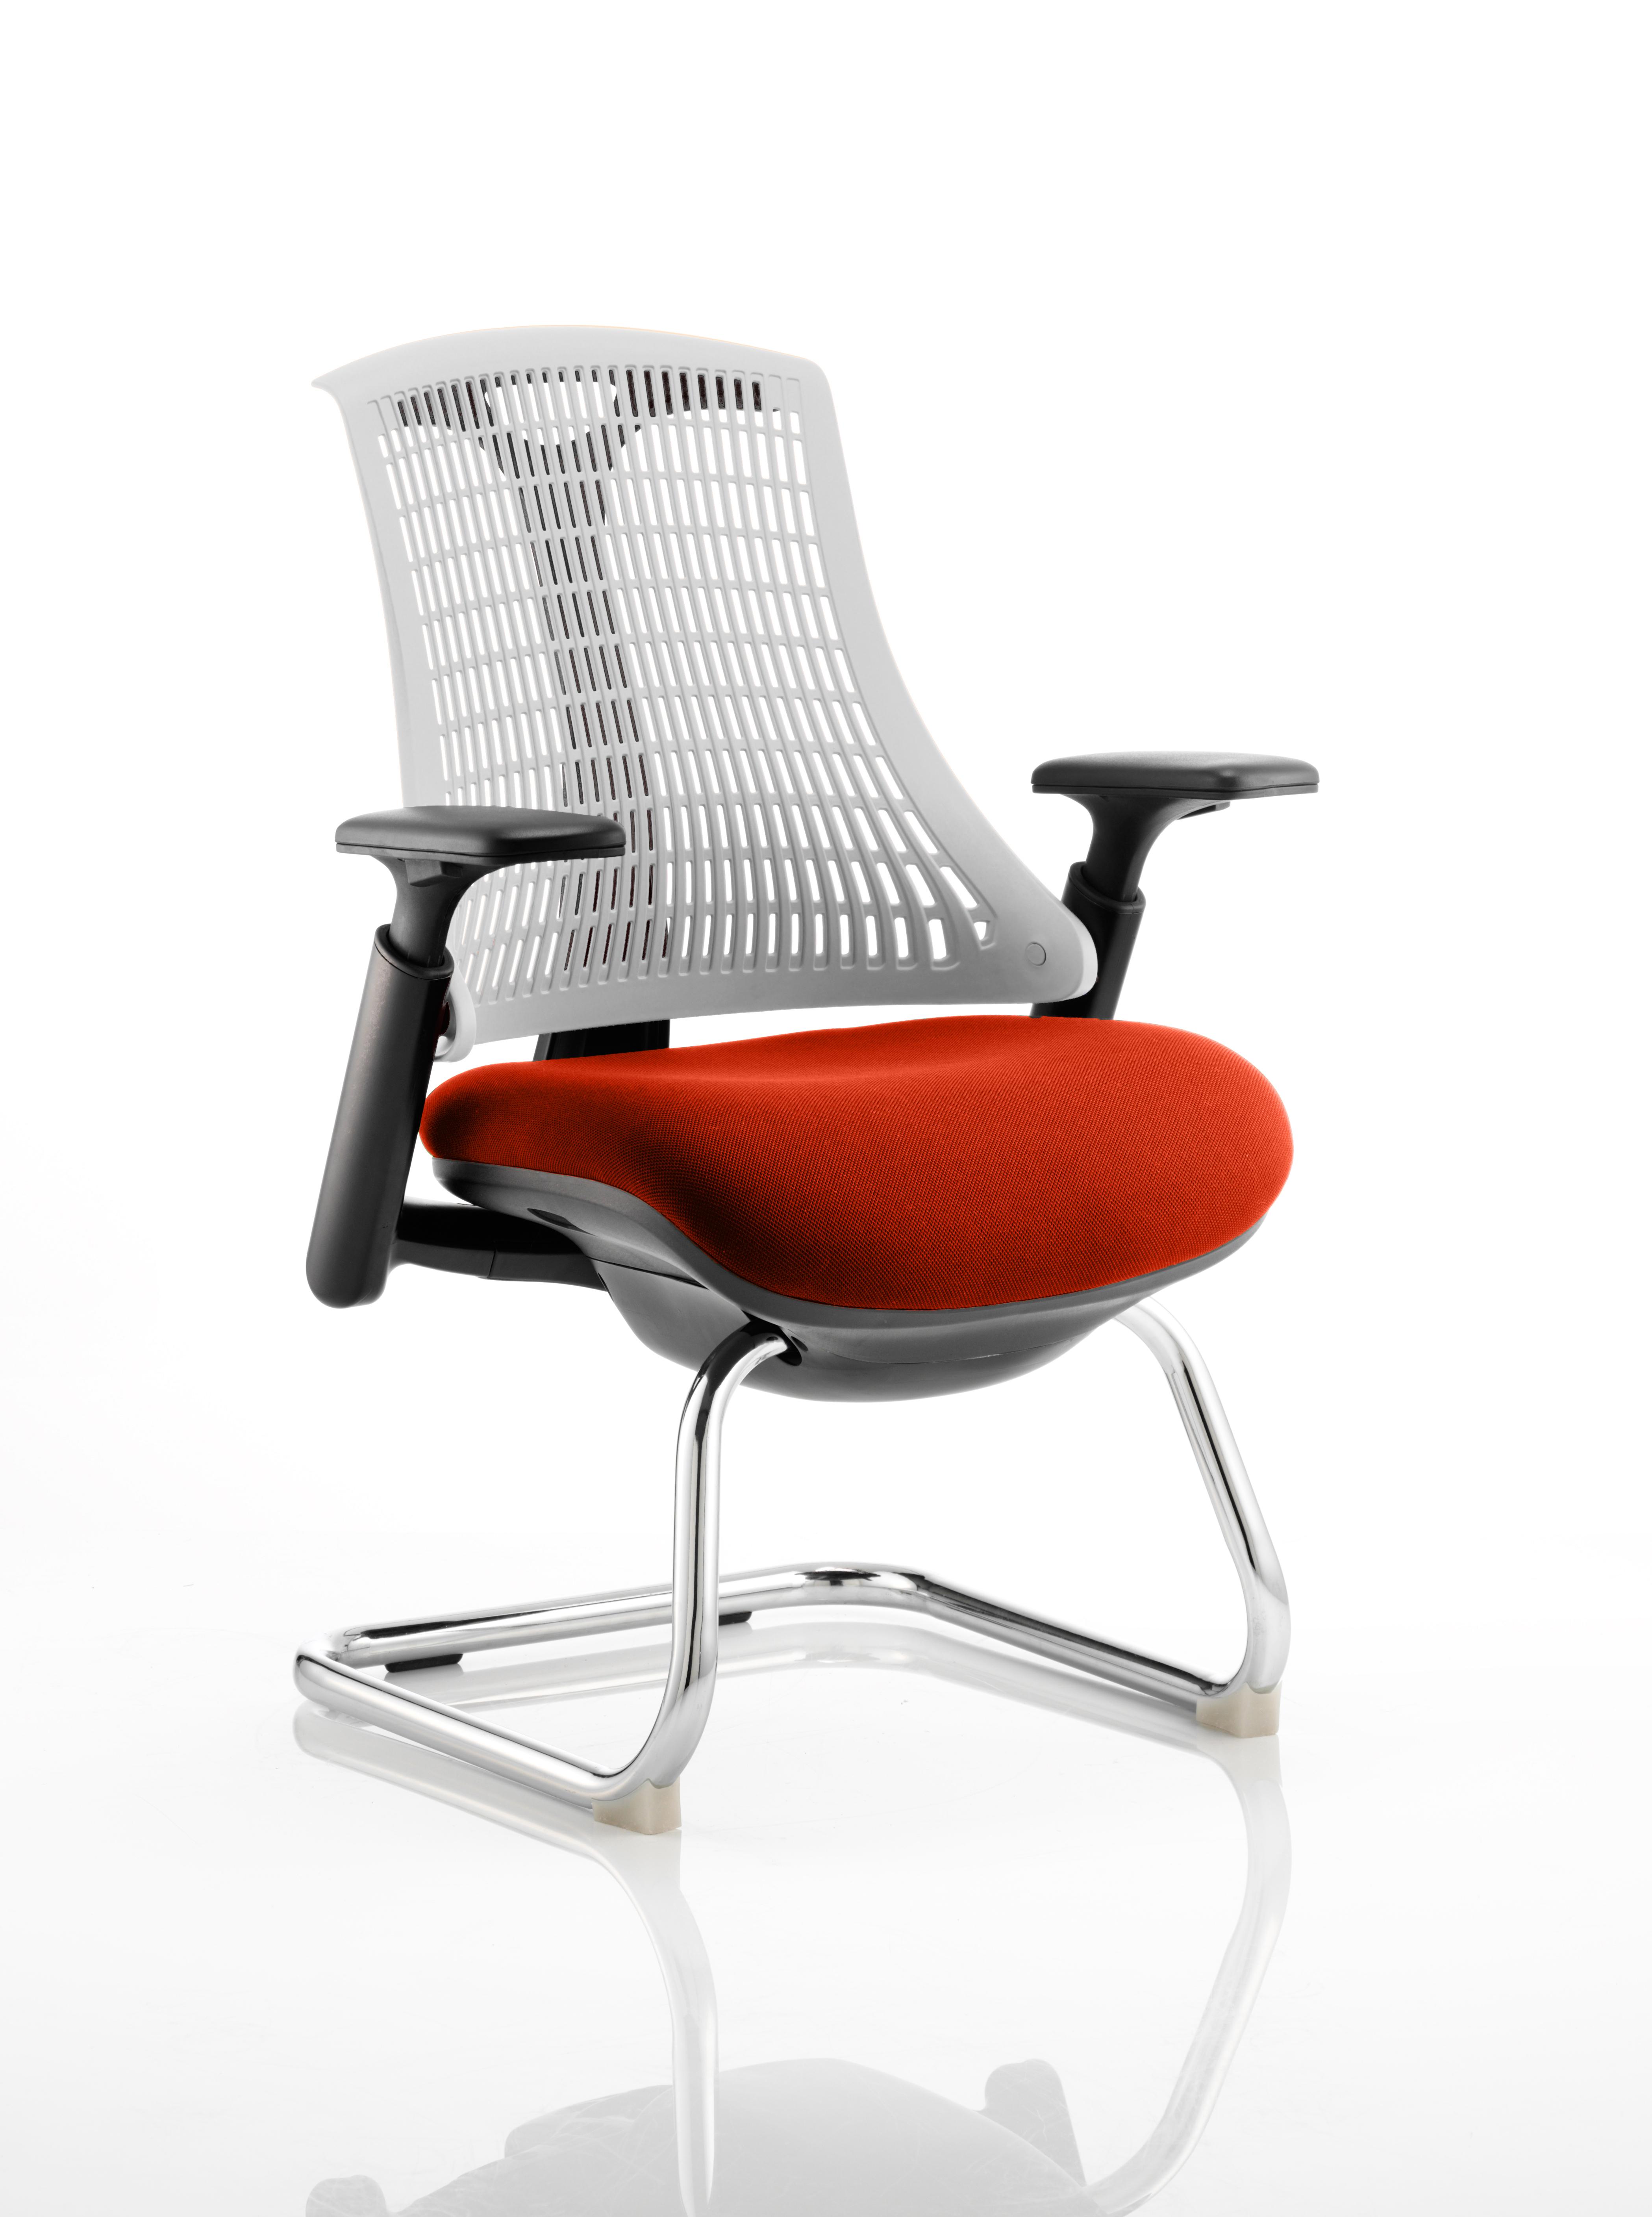 Flex Cantilever Chair Black Frame White Back Bespoke Colour Seat Tabasco Red